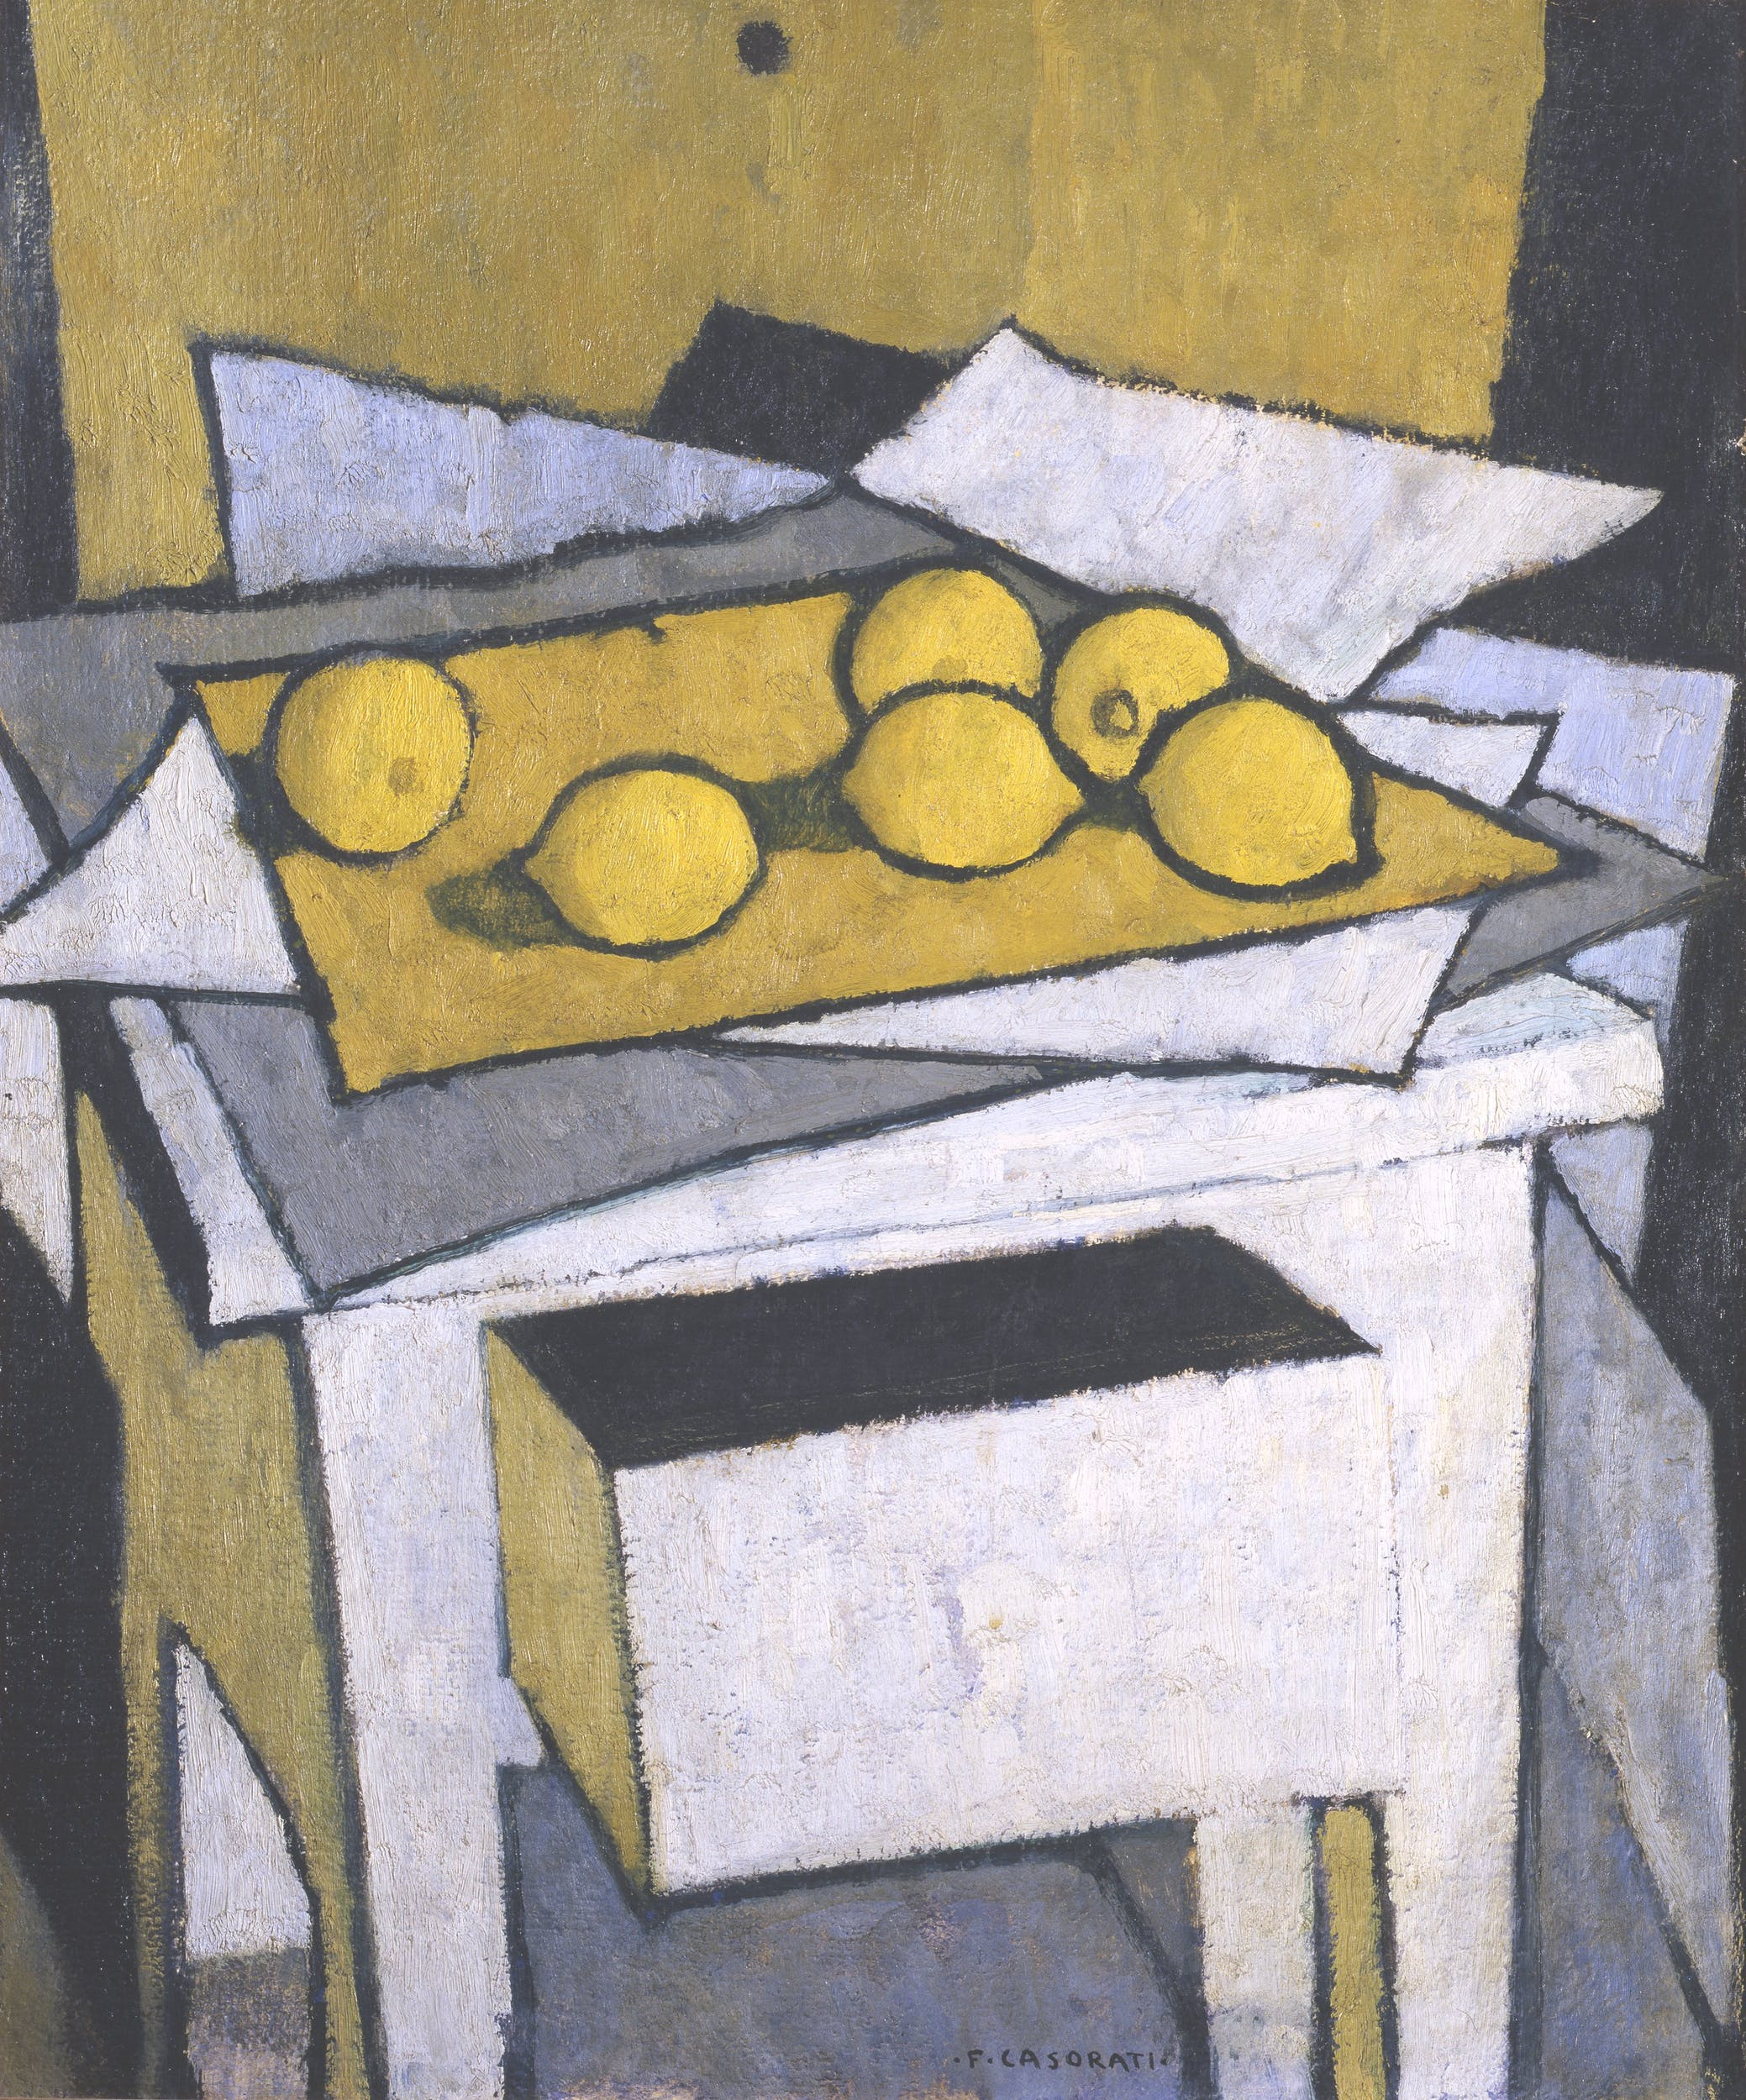 Felice Casorati (Novara 1883 - Torino 1963 ), I limoni, 1950 ca.